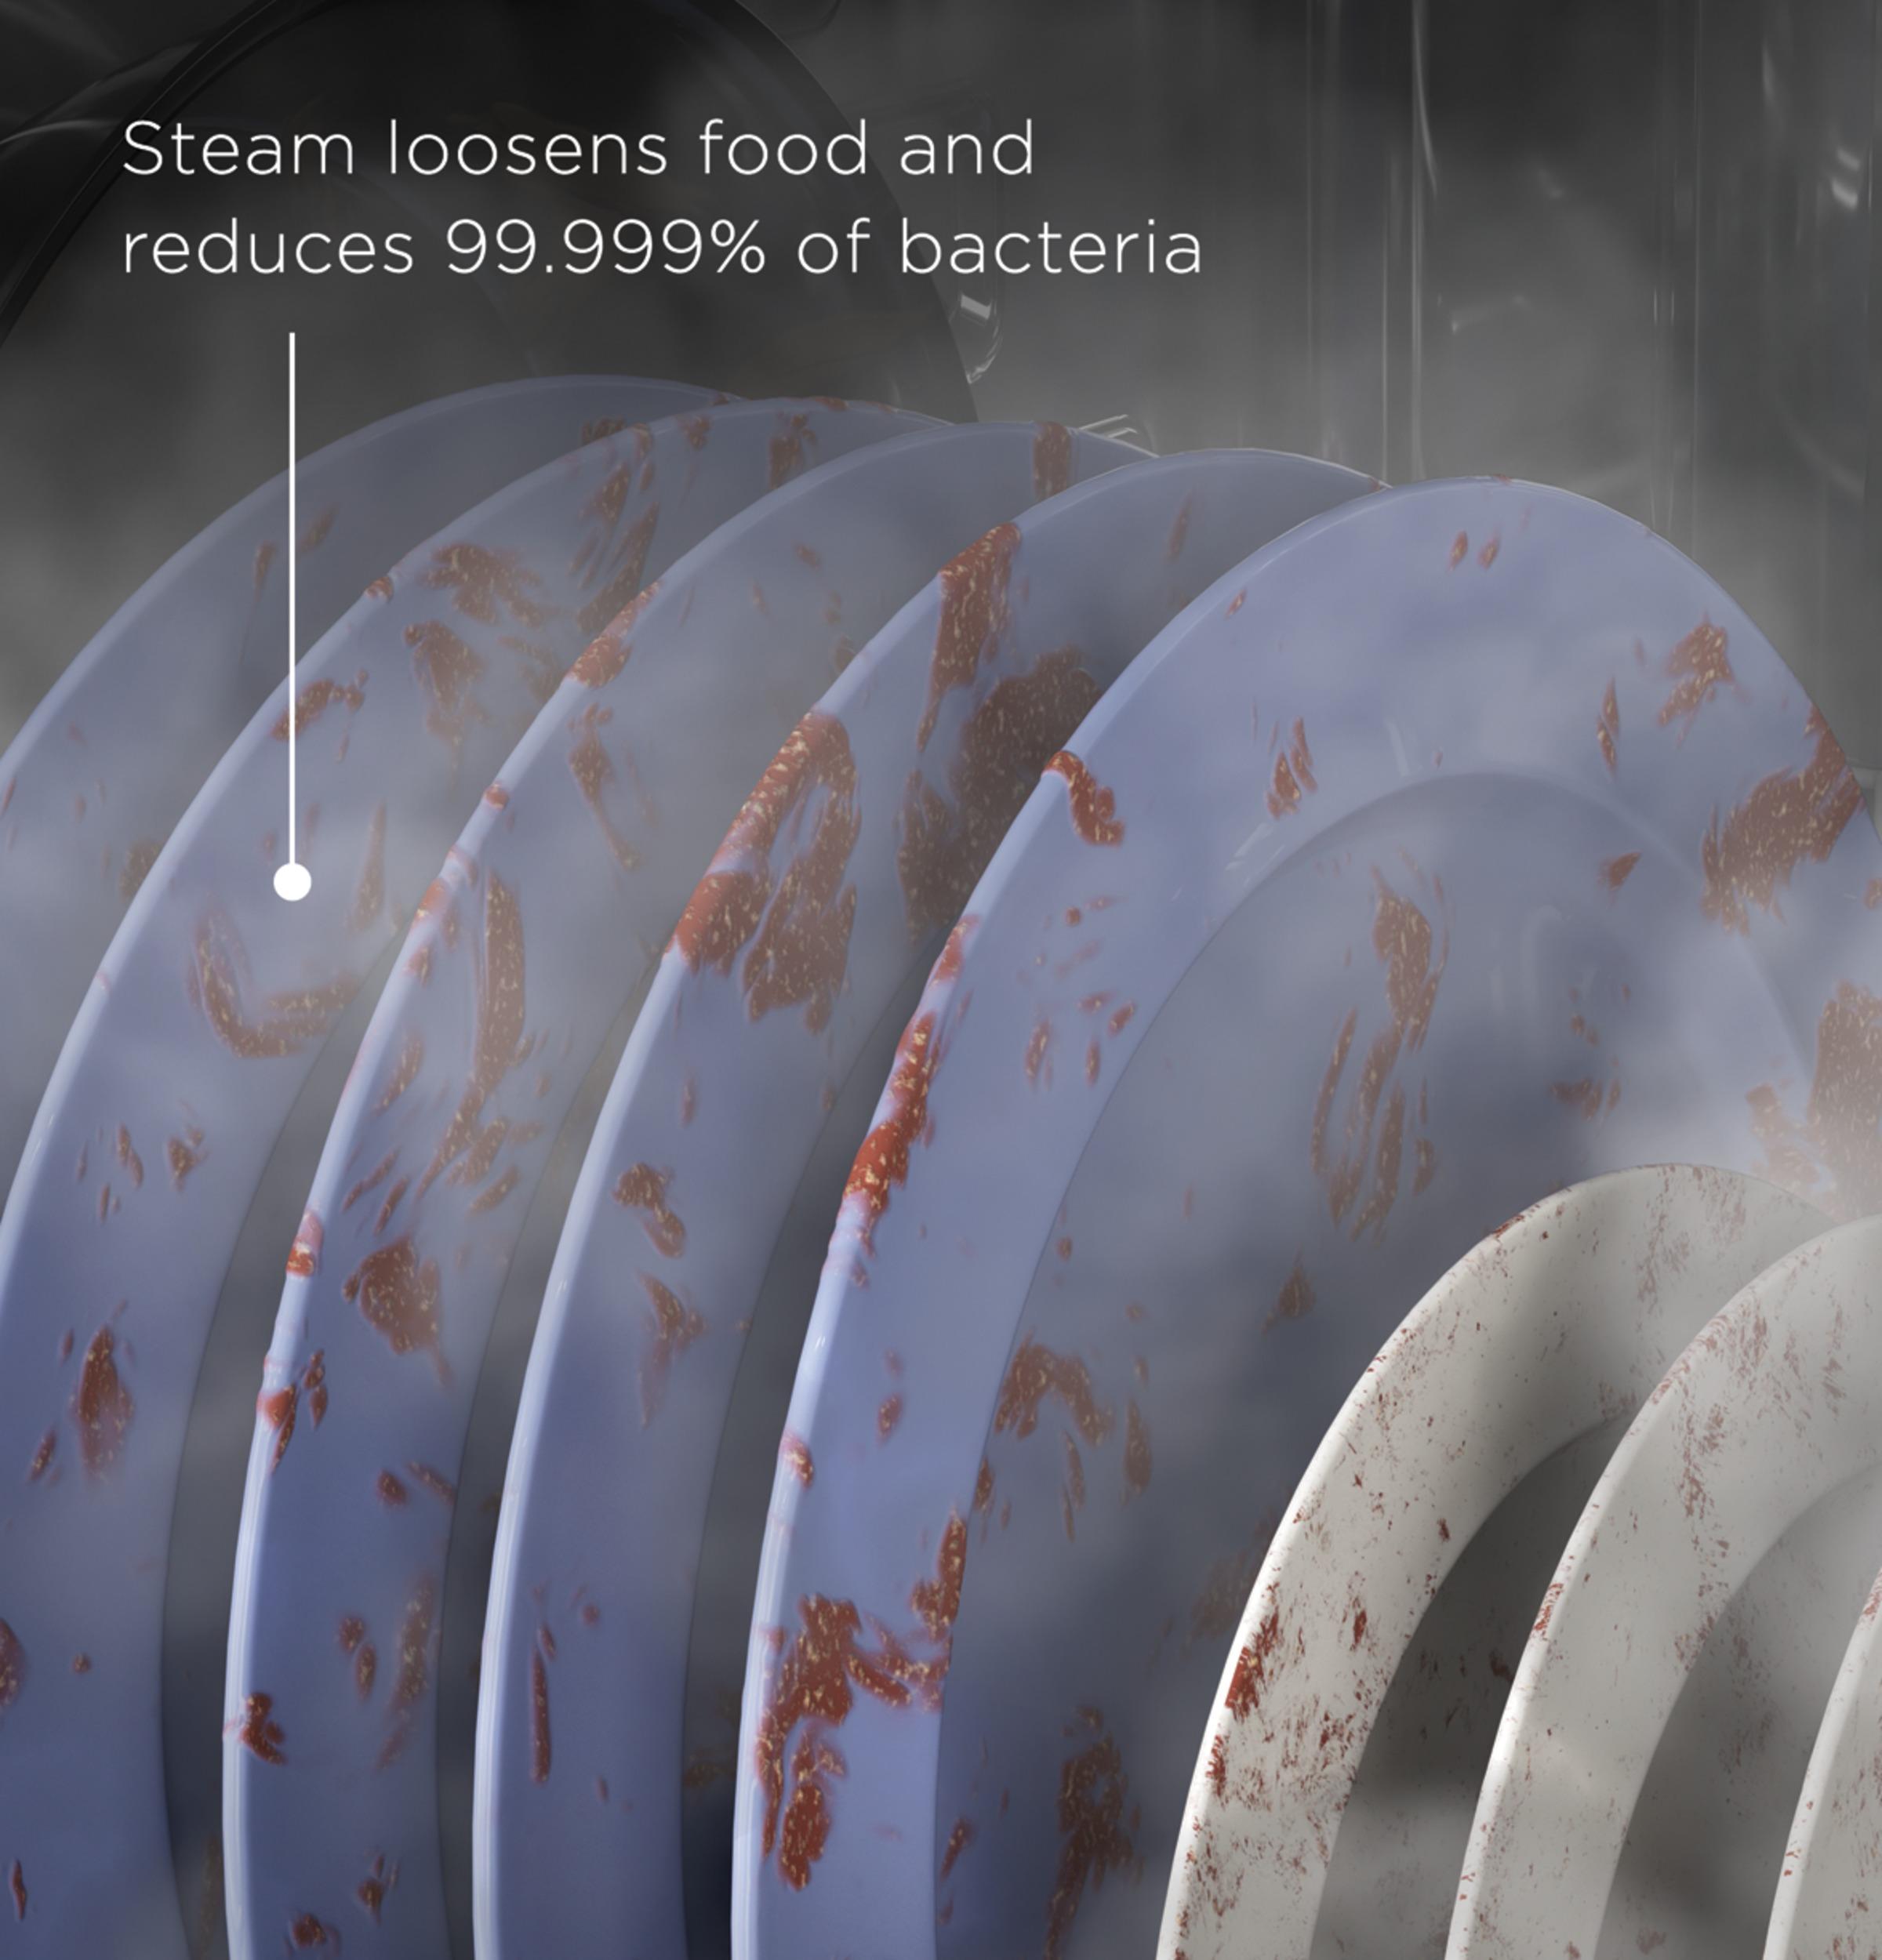 Model: GDT635HMMES | GE GE® Smart Hybrid Stainless Steel Interior Dishwasher with Hidden Controls